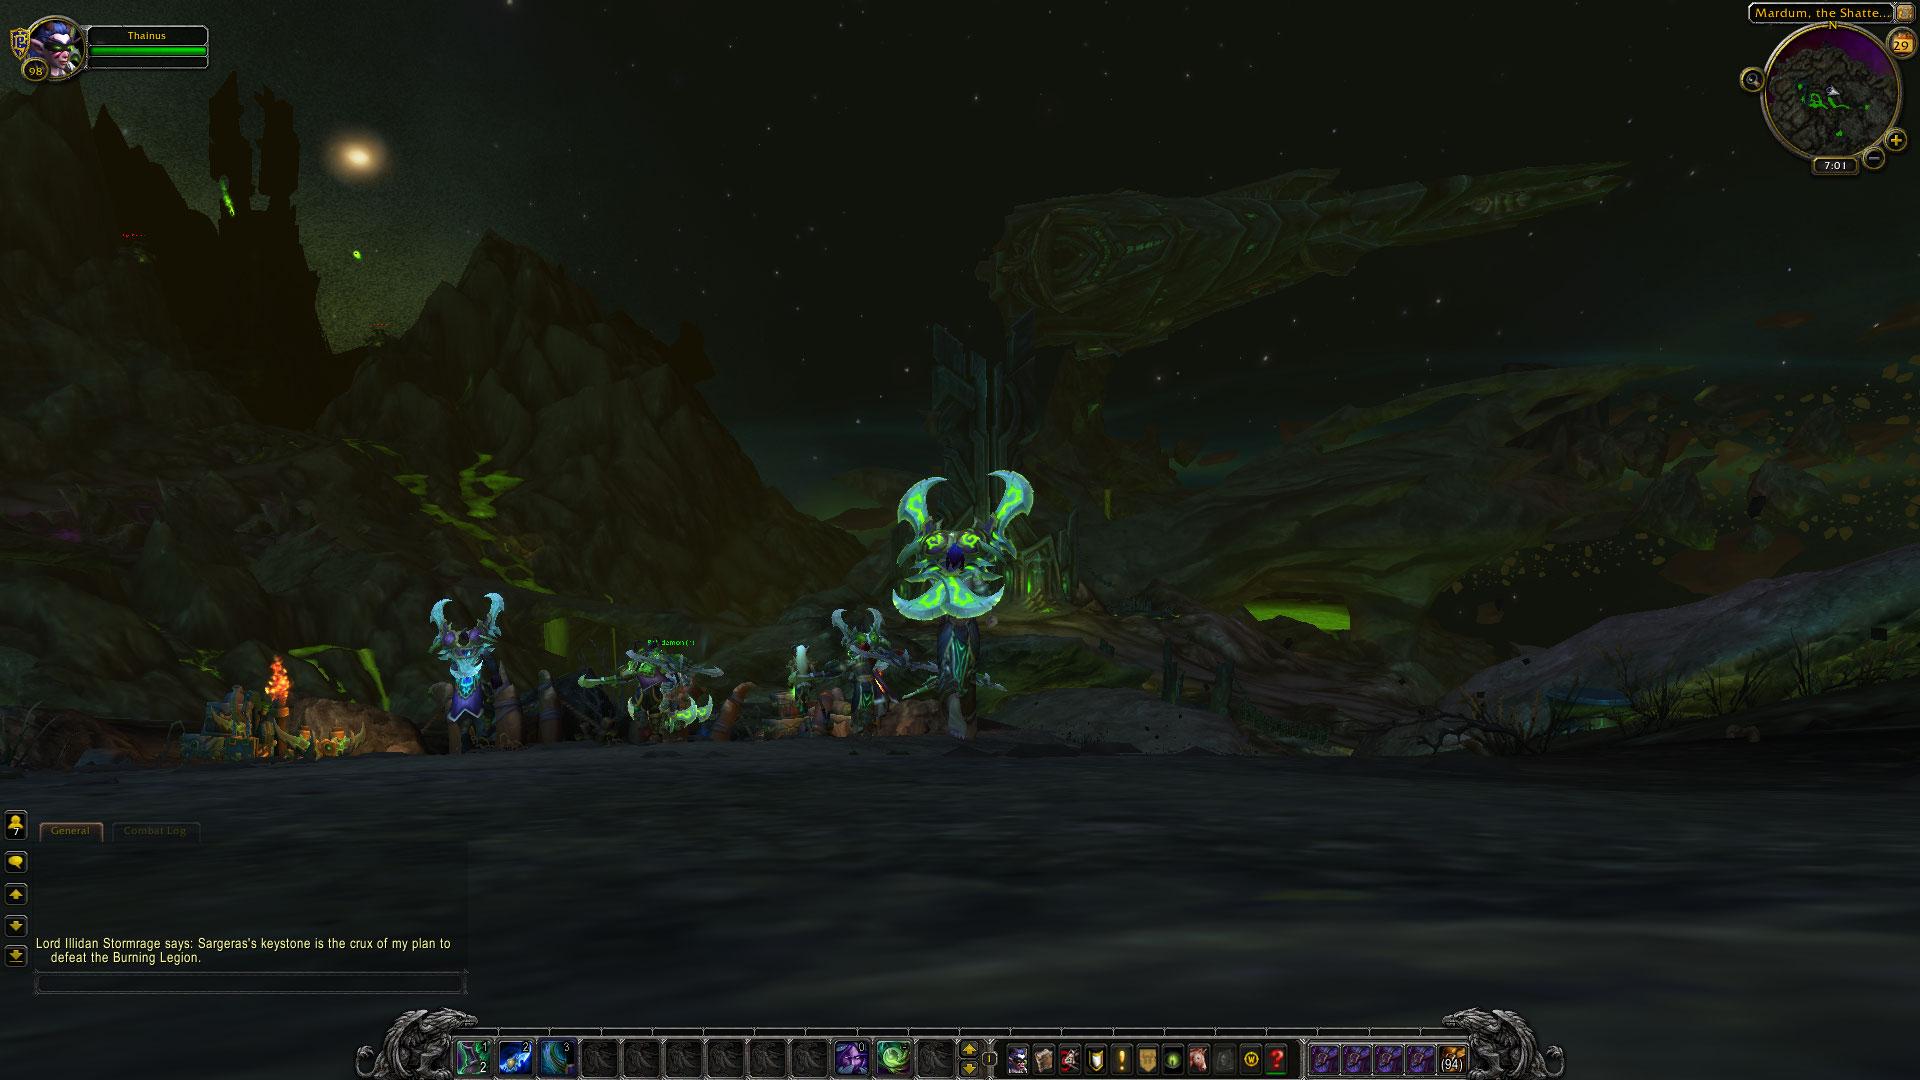 World of Warcraft: Legion fotoseriál - Plamenná legie přichází 129823